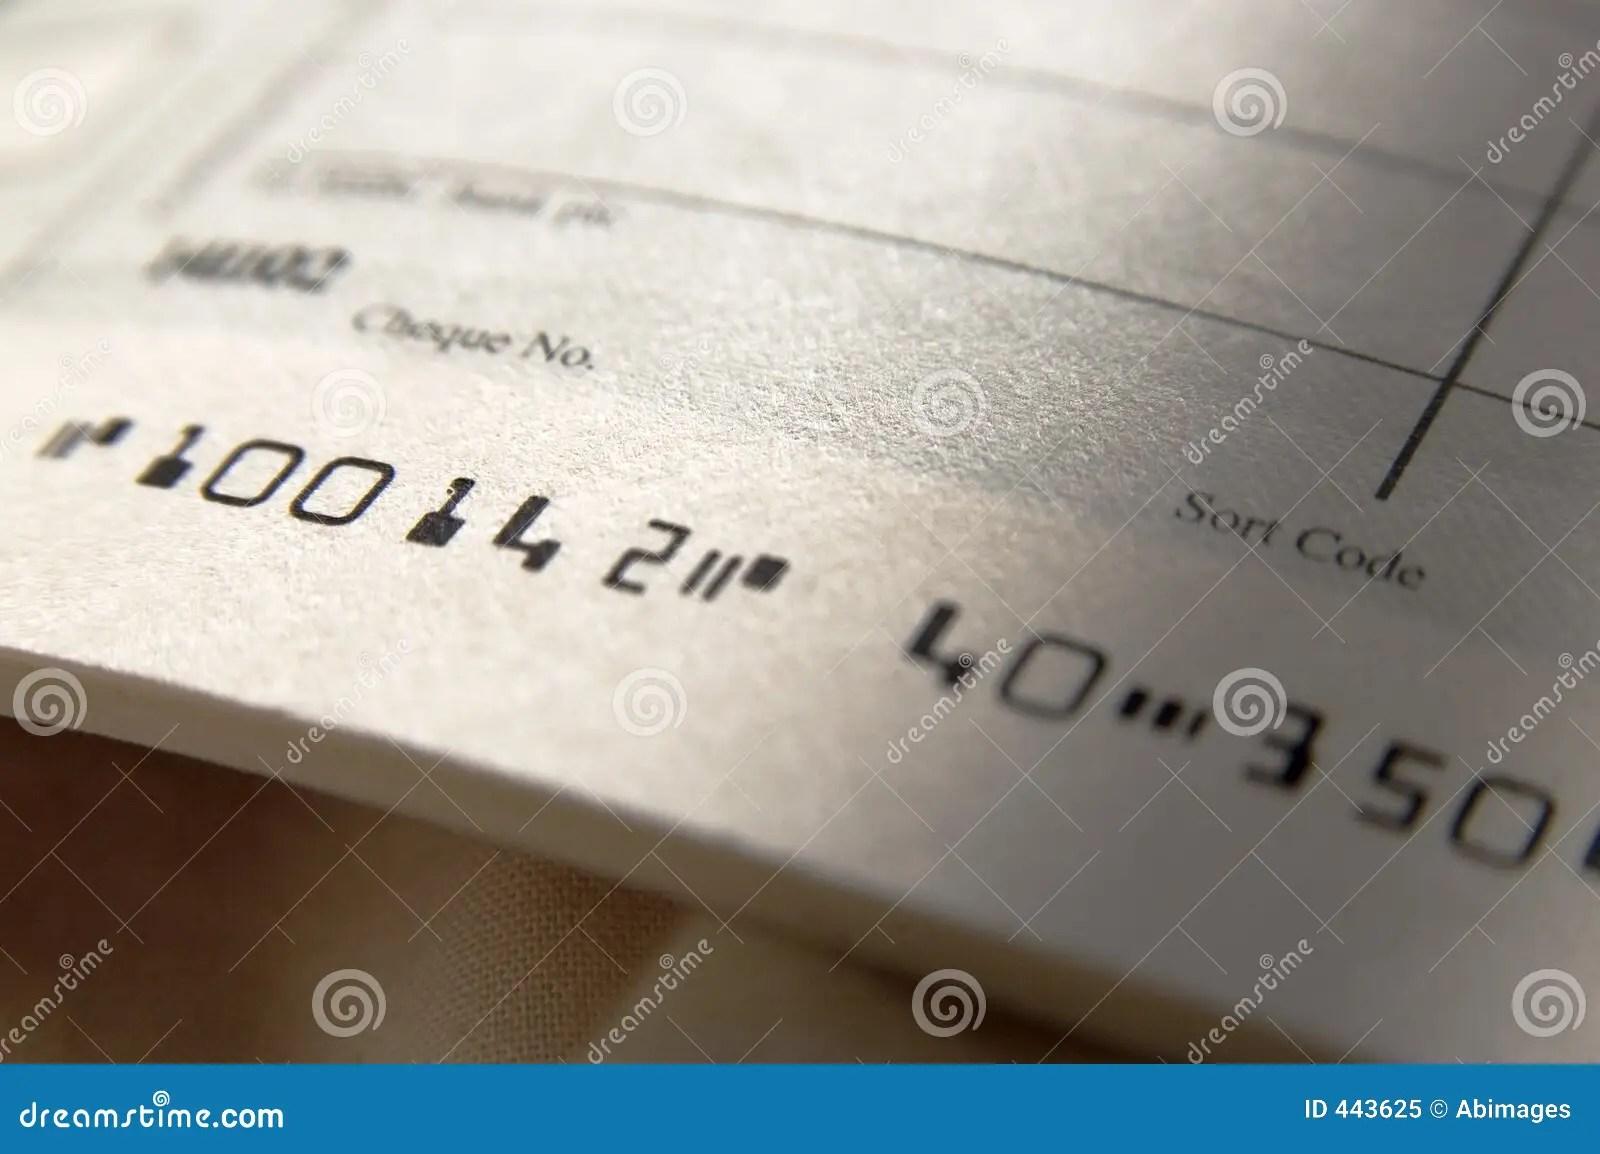 United Bank Personal Loan